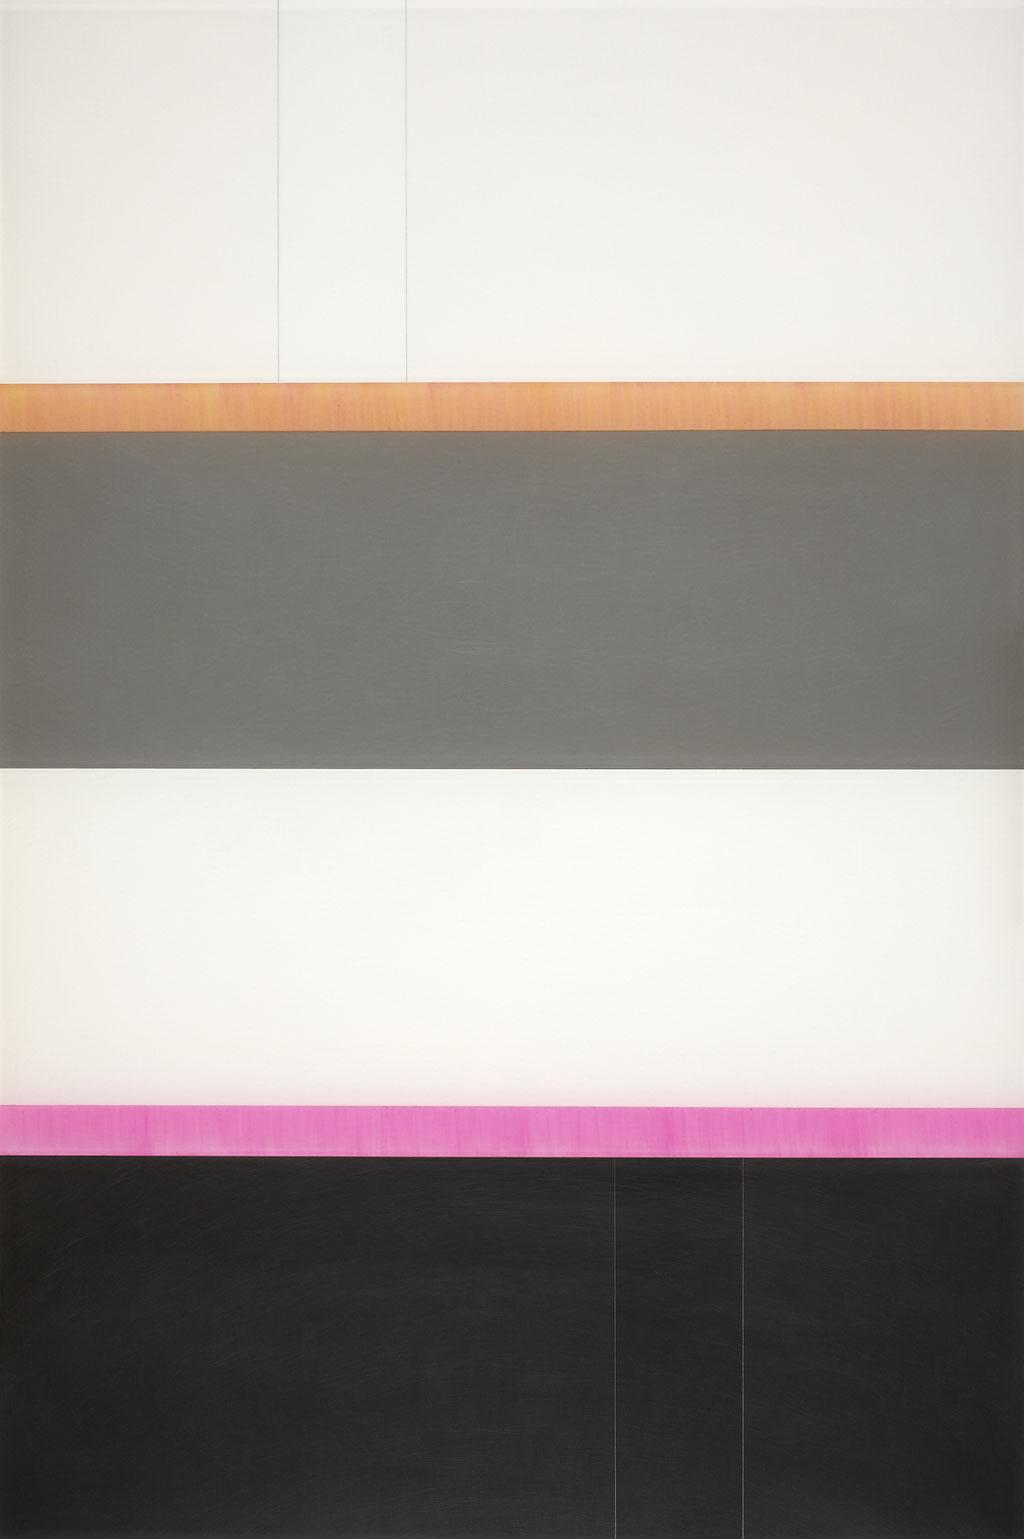 Manifold:0001 - acrylic on acrylic sheet - 60 x 40 cm